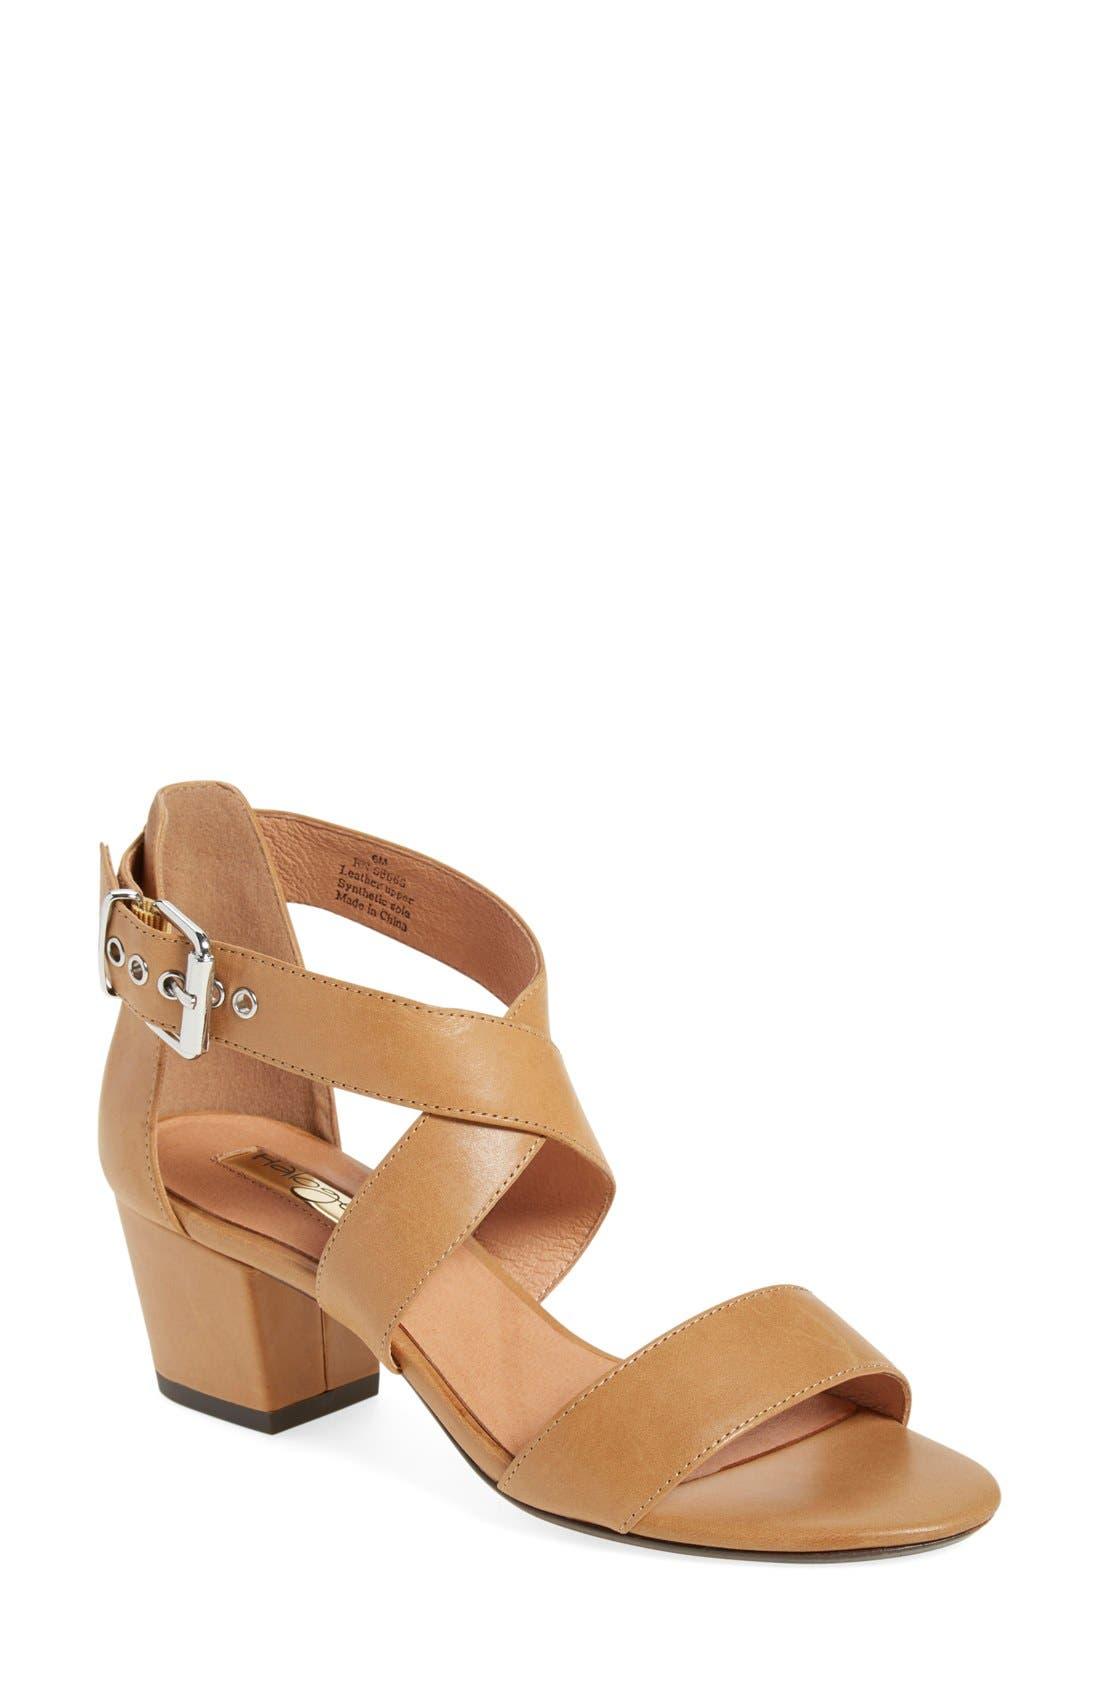 Halogen 'Rena' Crisscross Strap Sandal,                         Main,                         color, Cognac